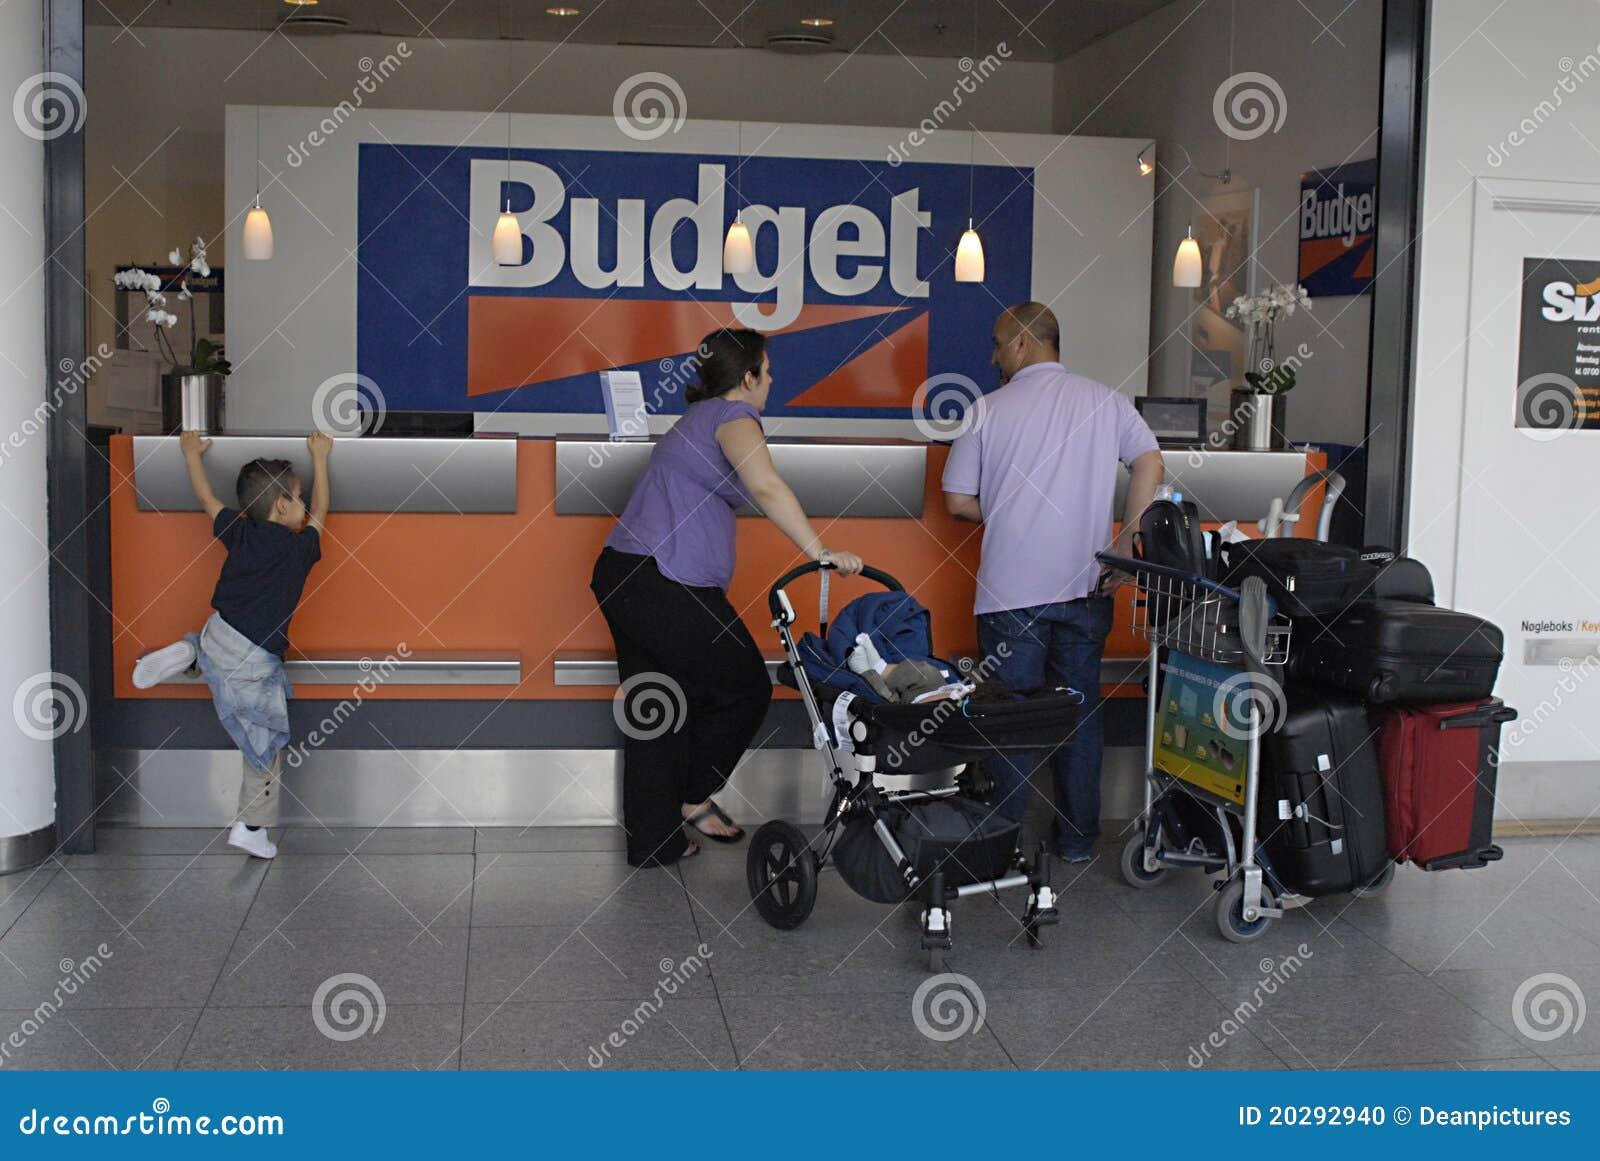 Budget Car Rental Copenhagen Airport